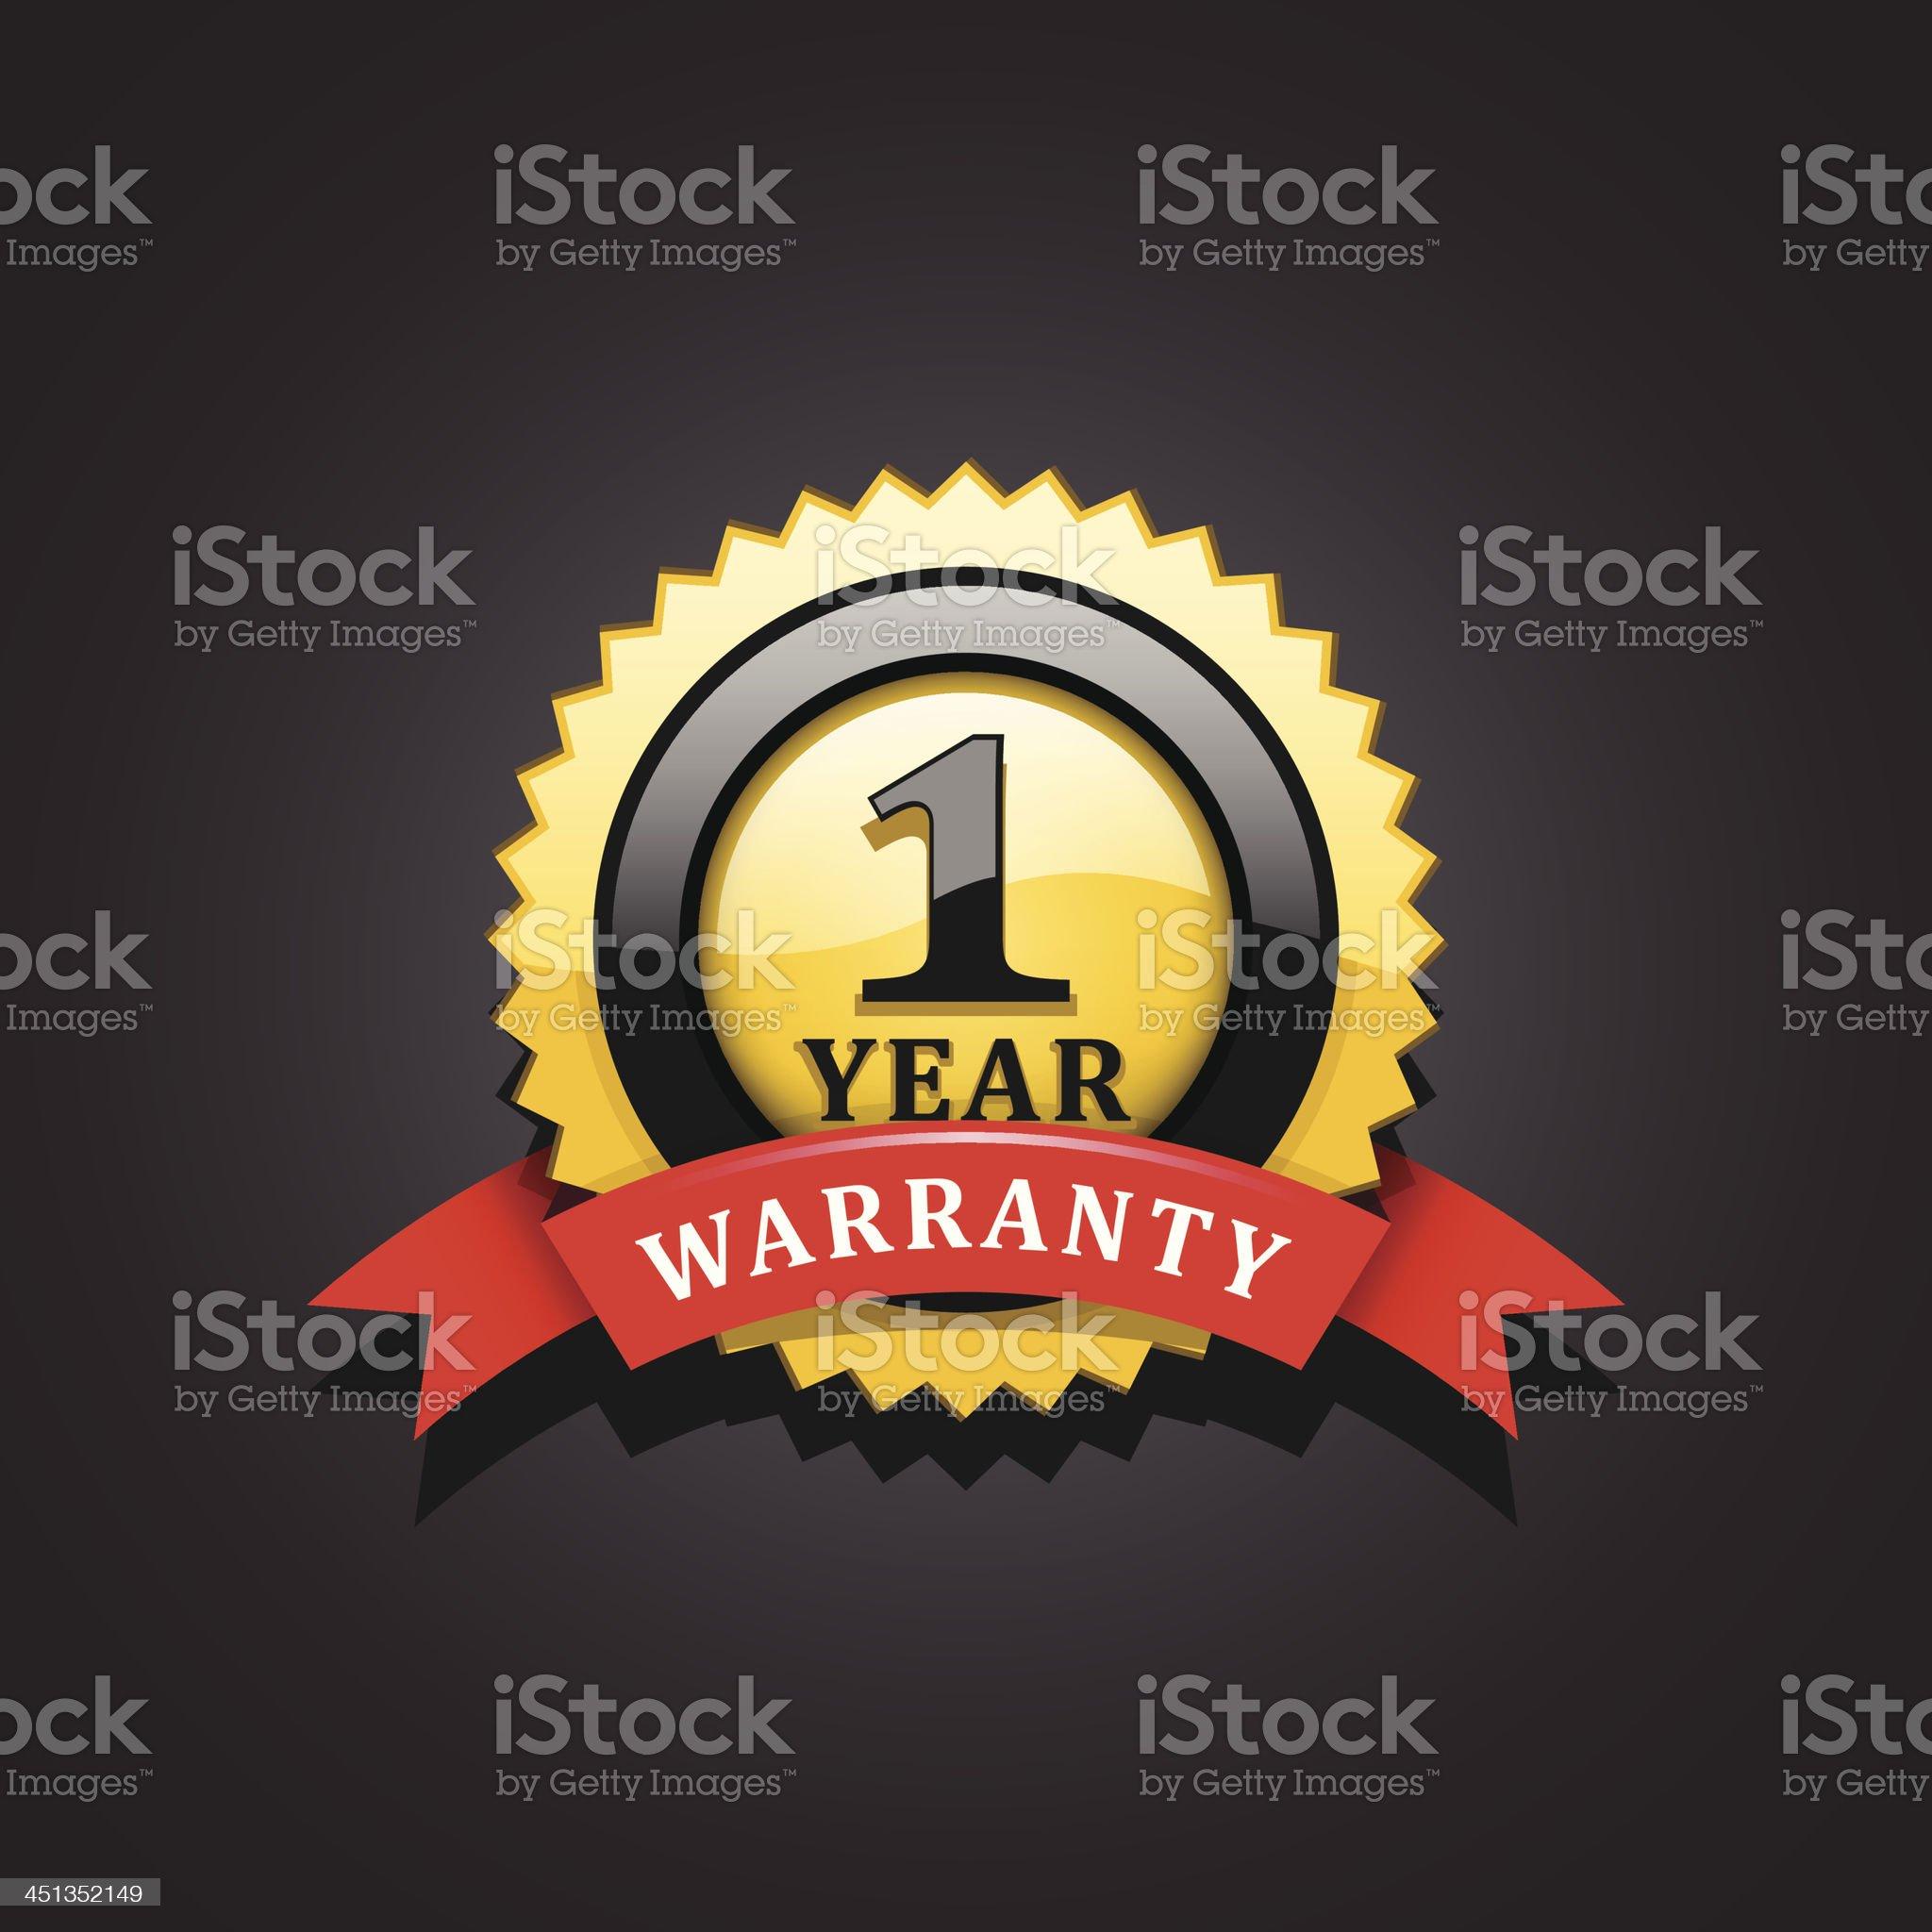 One year warranty emblem royalty-free stock vector art